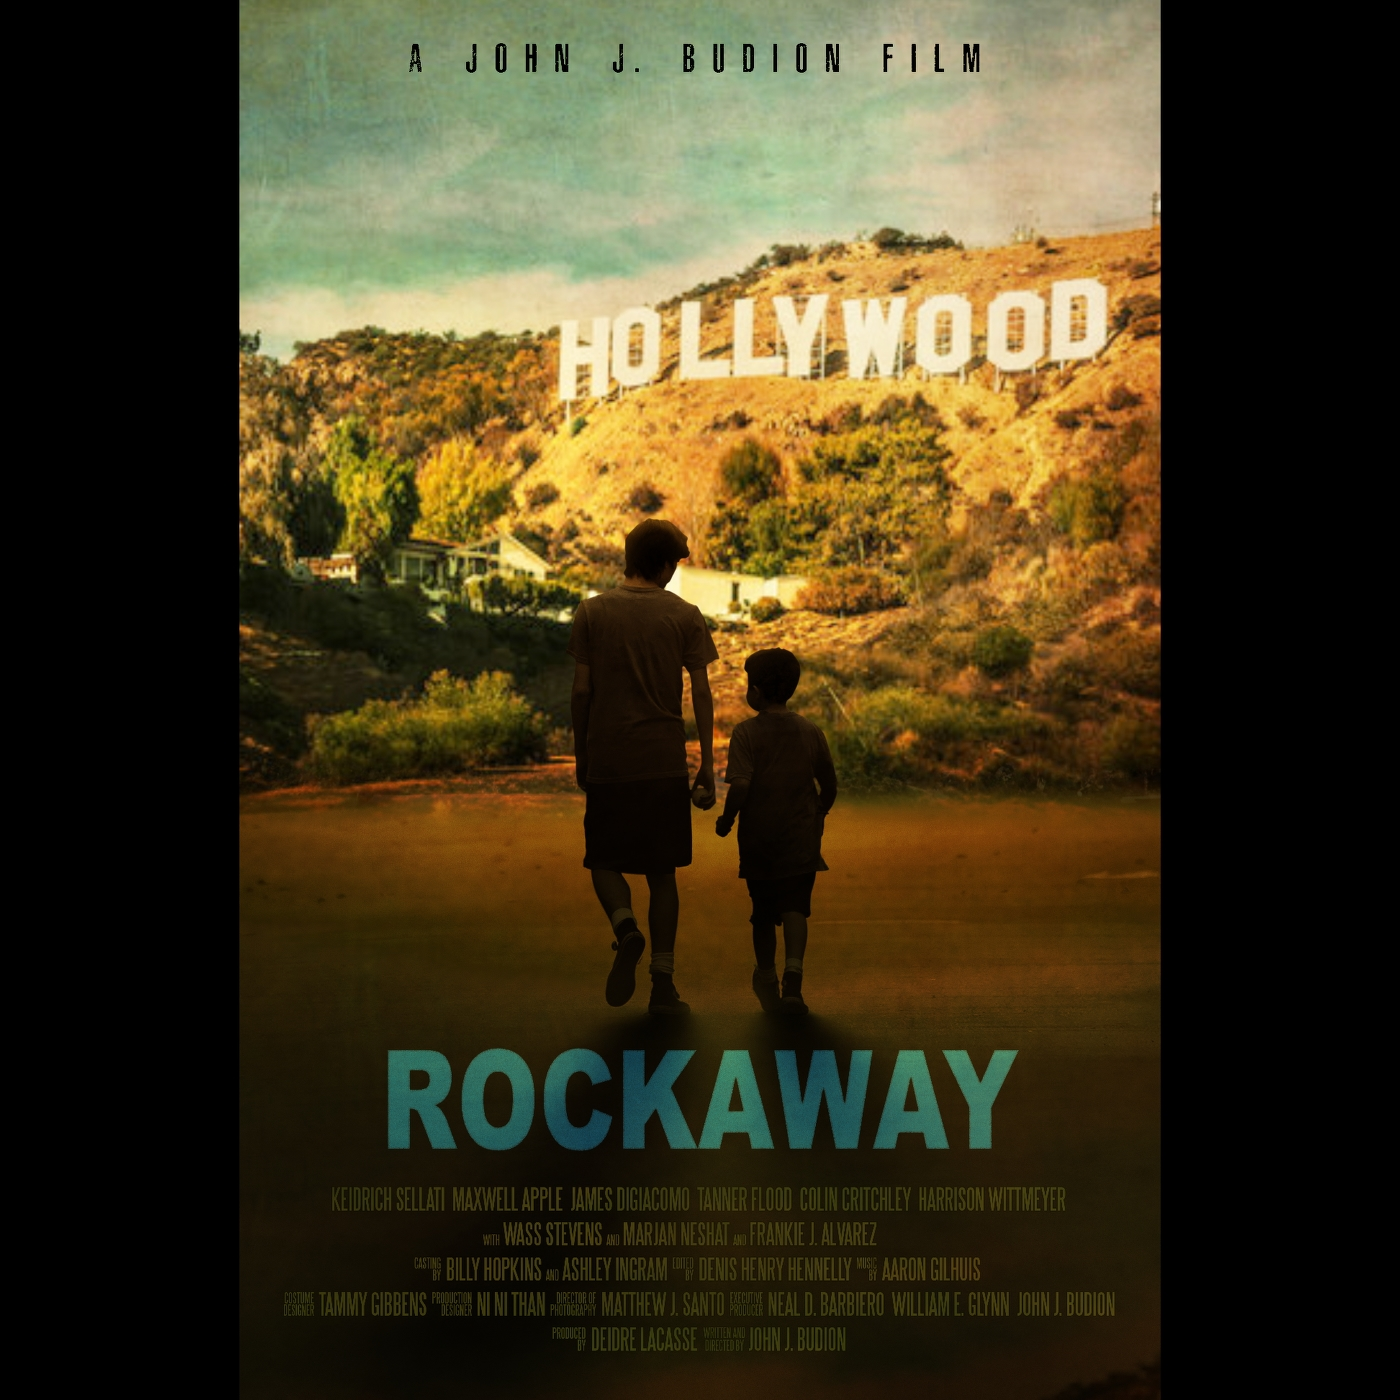 Hollywood_Promo01_Title2.0000.jpg